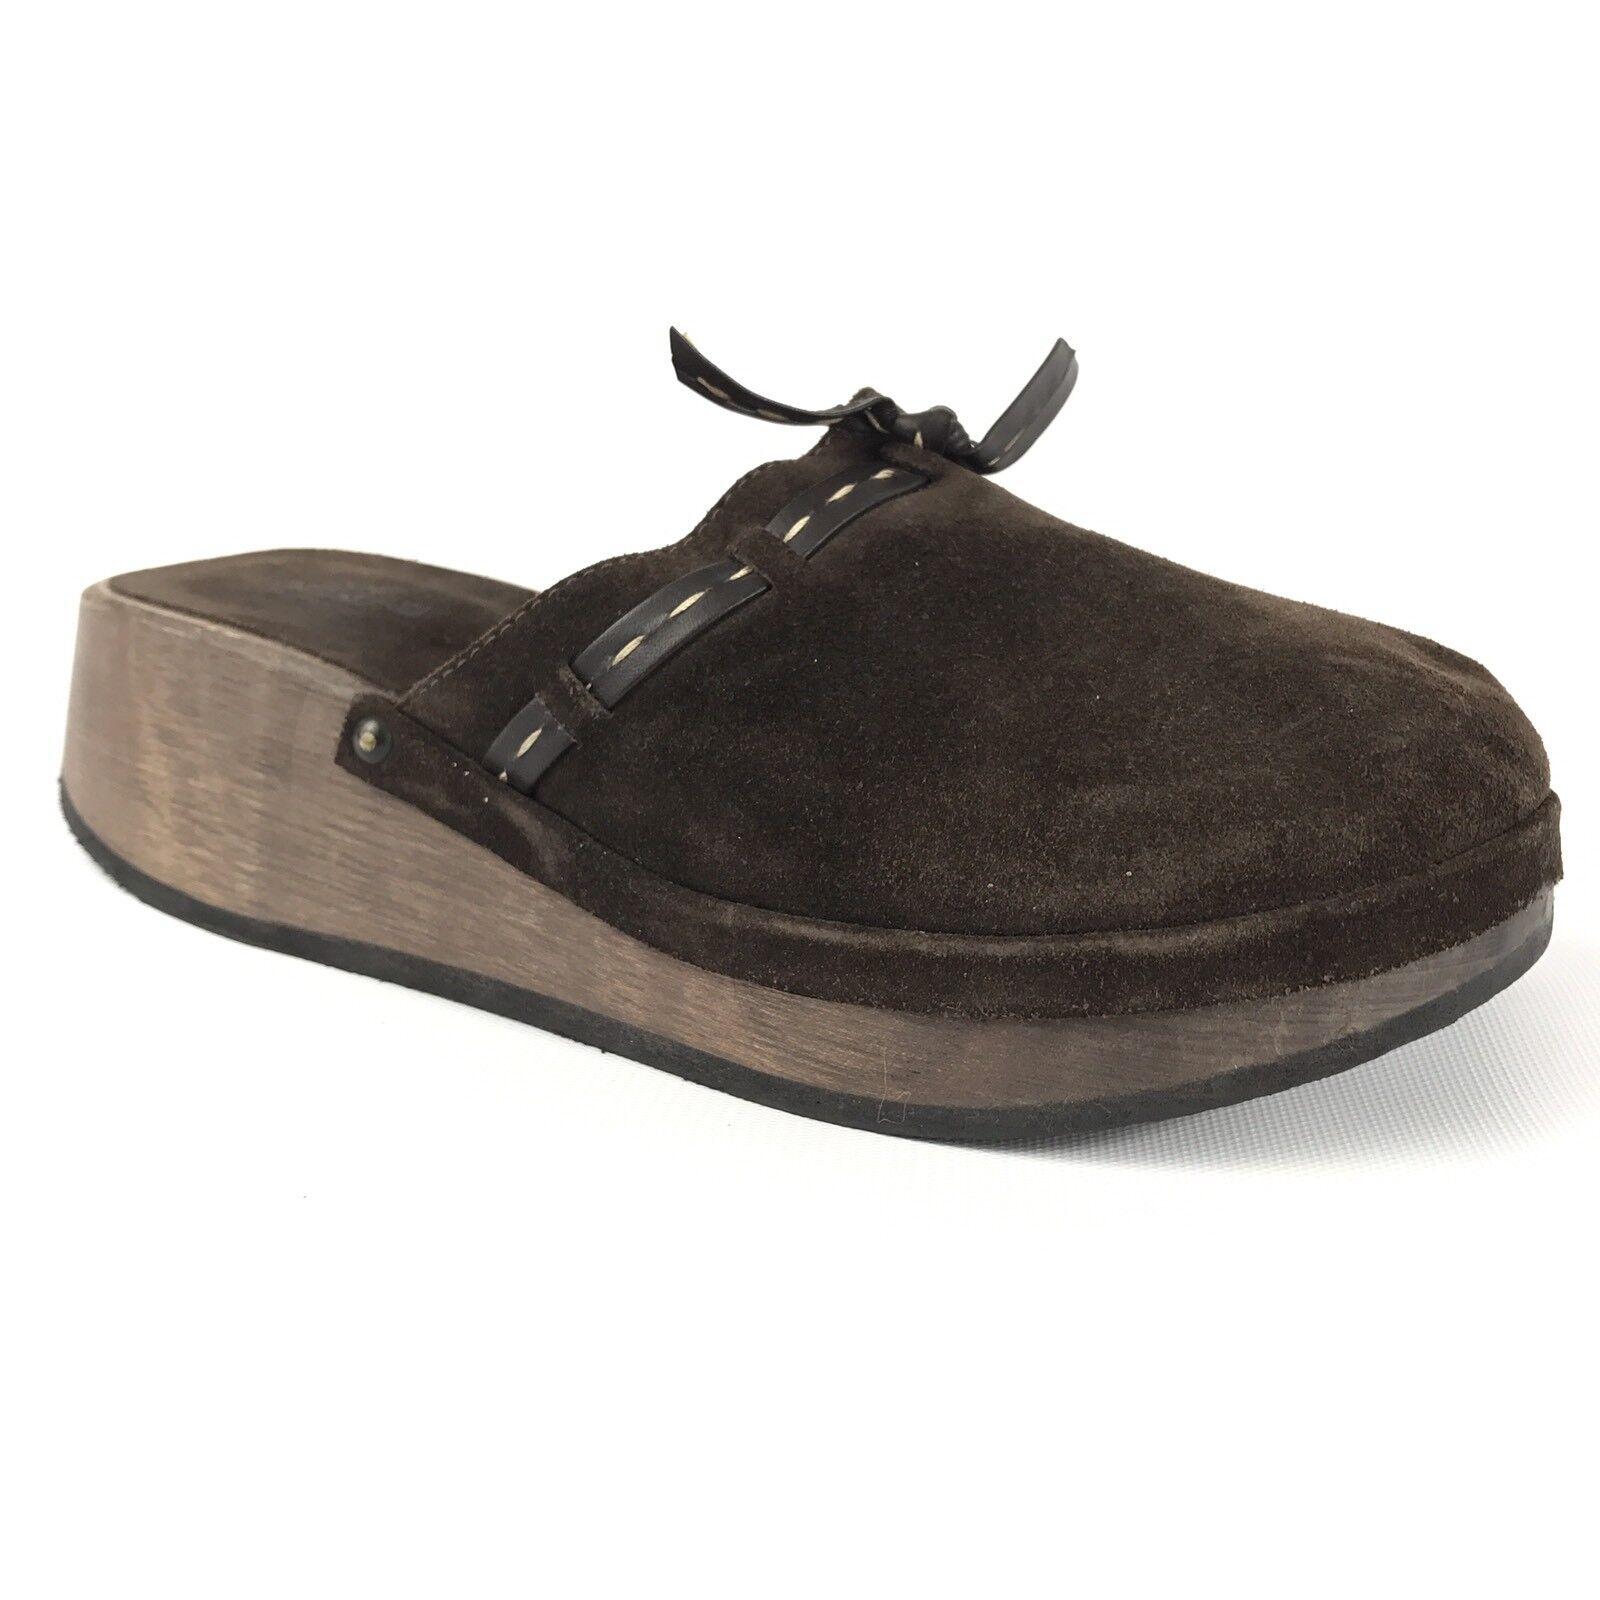 J Crew Women Clogs 8 Dark Brown Suede Suede Brown Leather Rubber Low Heel Walking Slip Italy 87ef7a